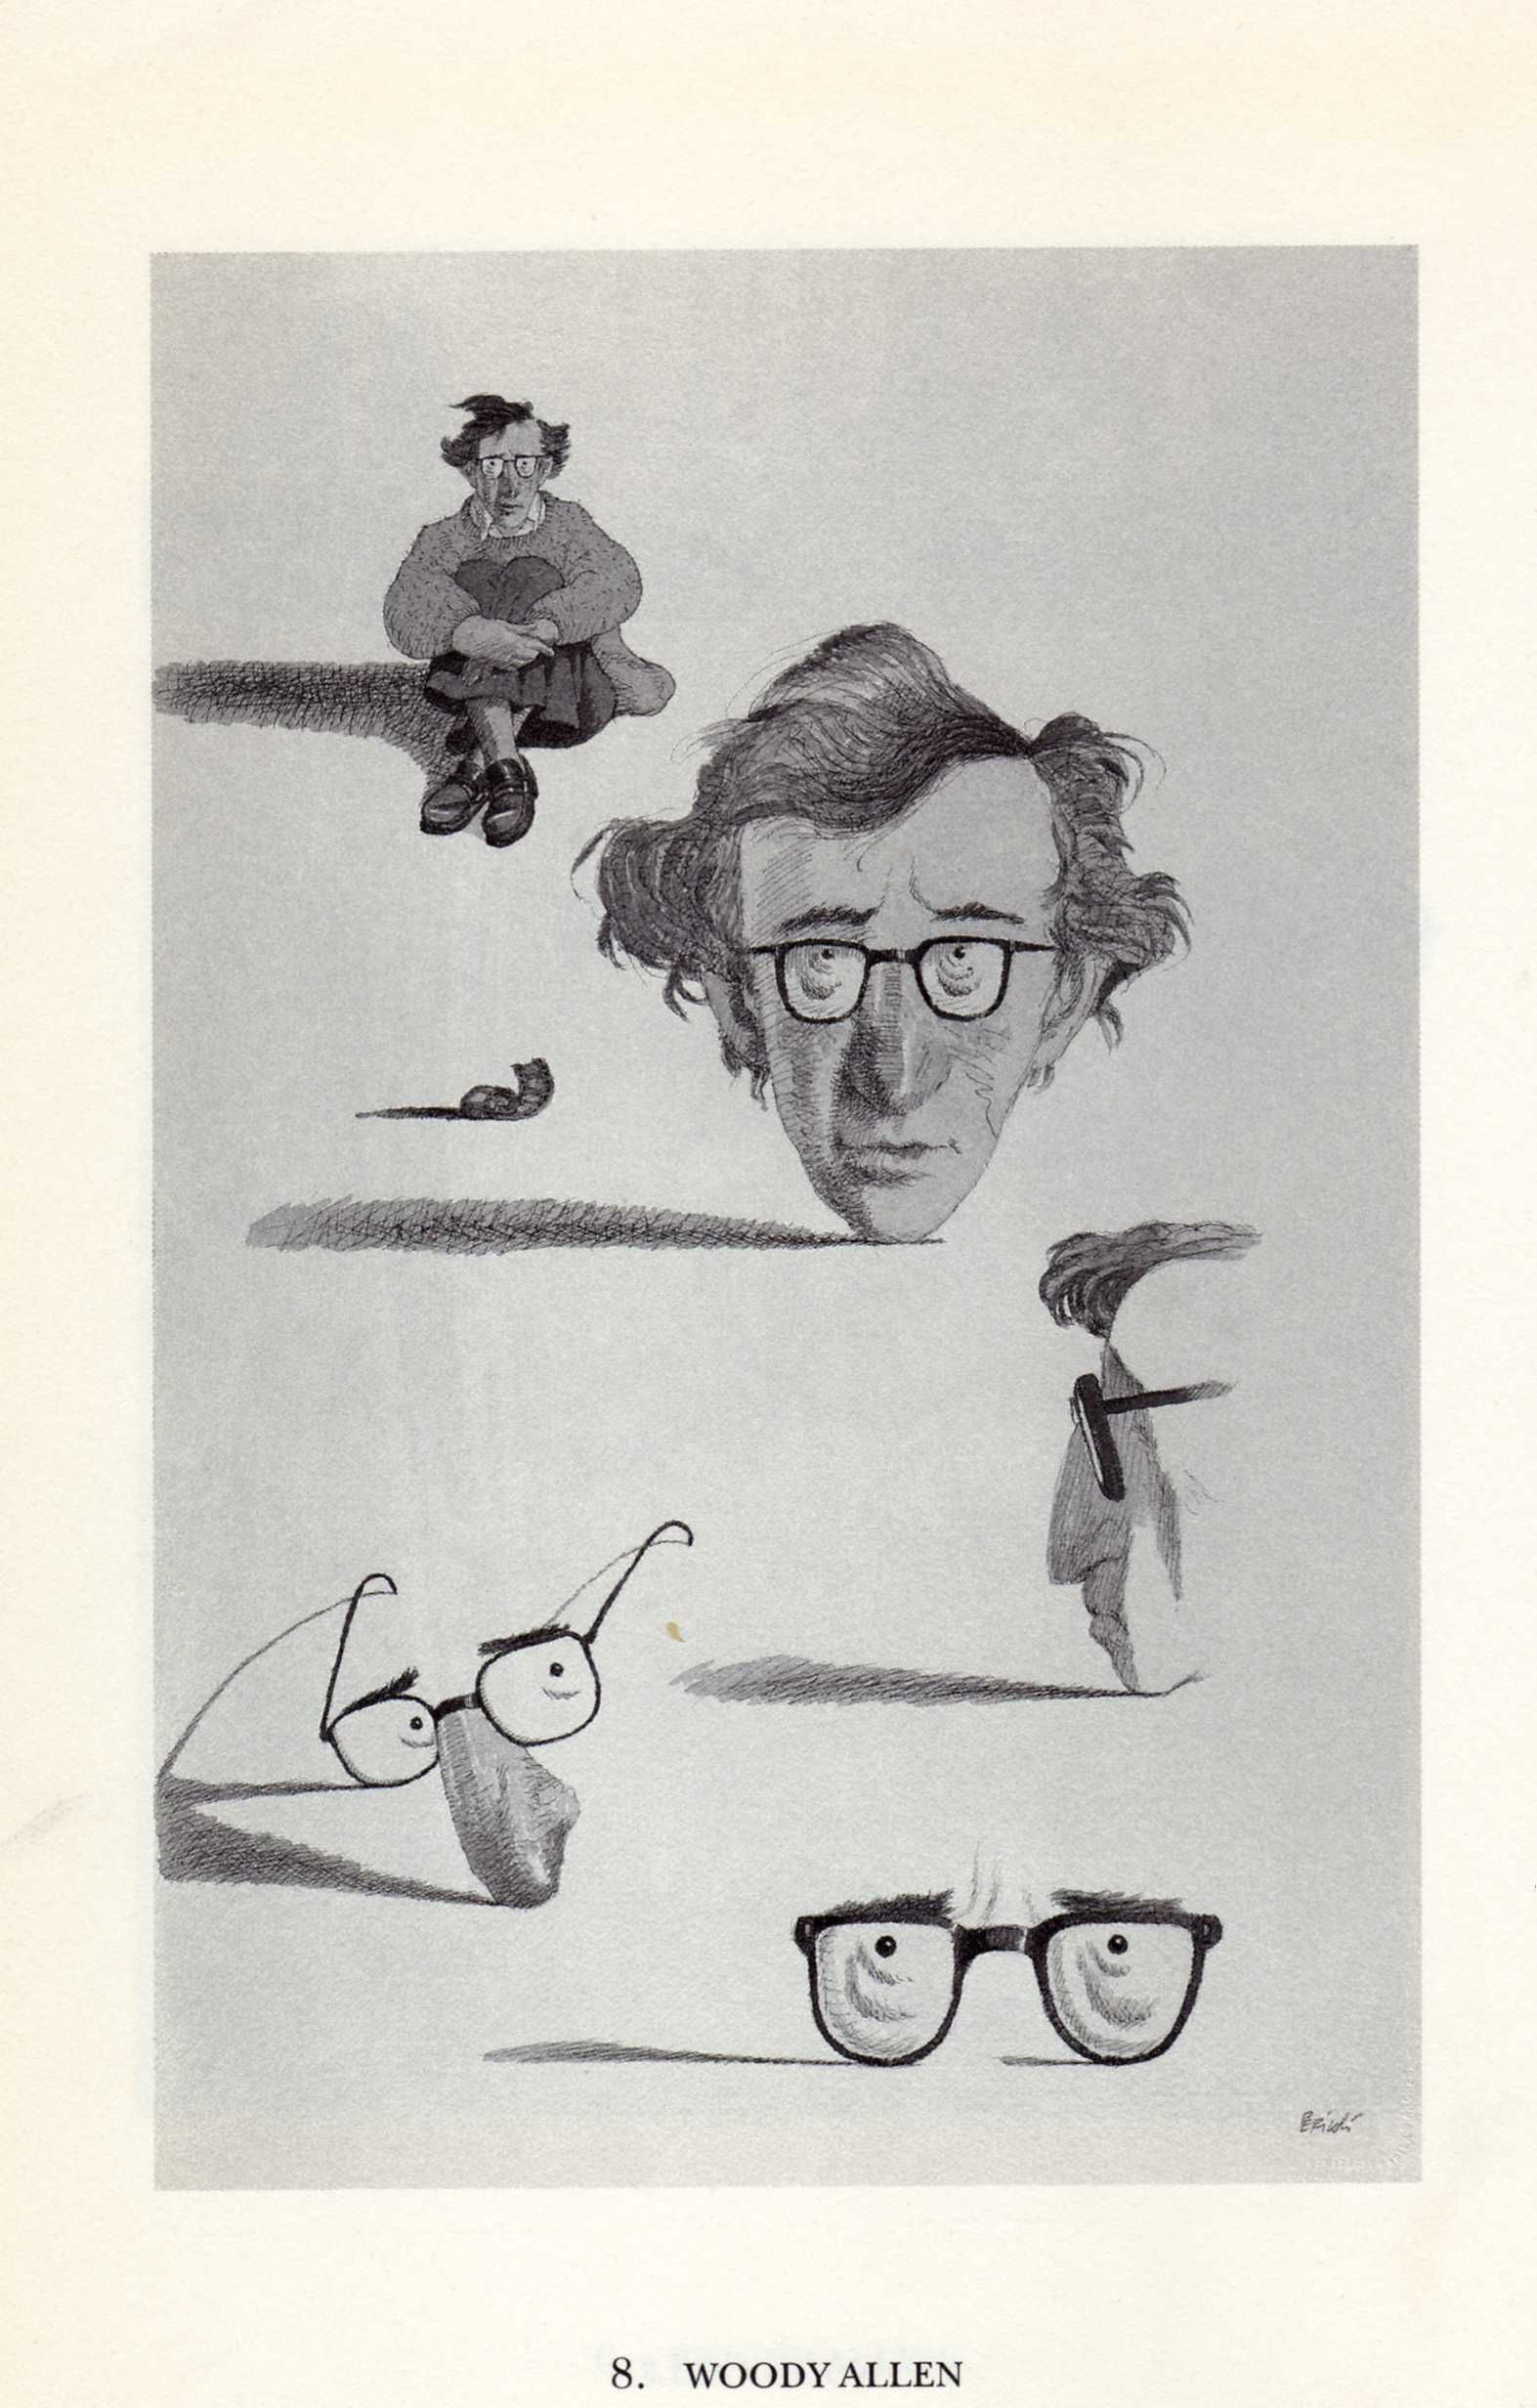 Tullio Pericoli Woody Allen Illustration Ilustraciones Arte